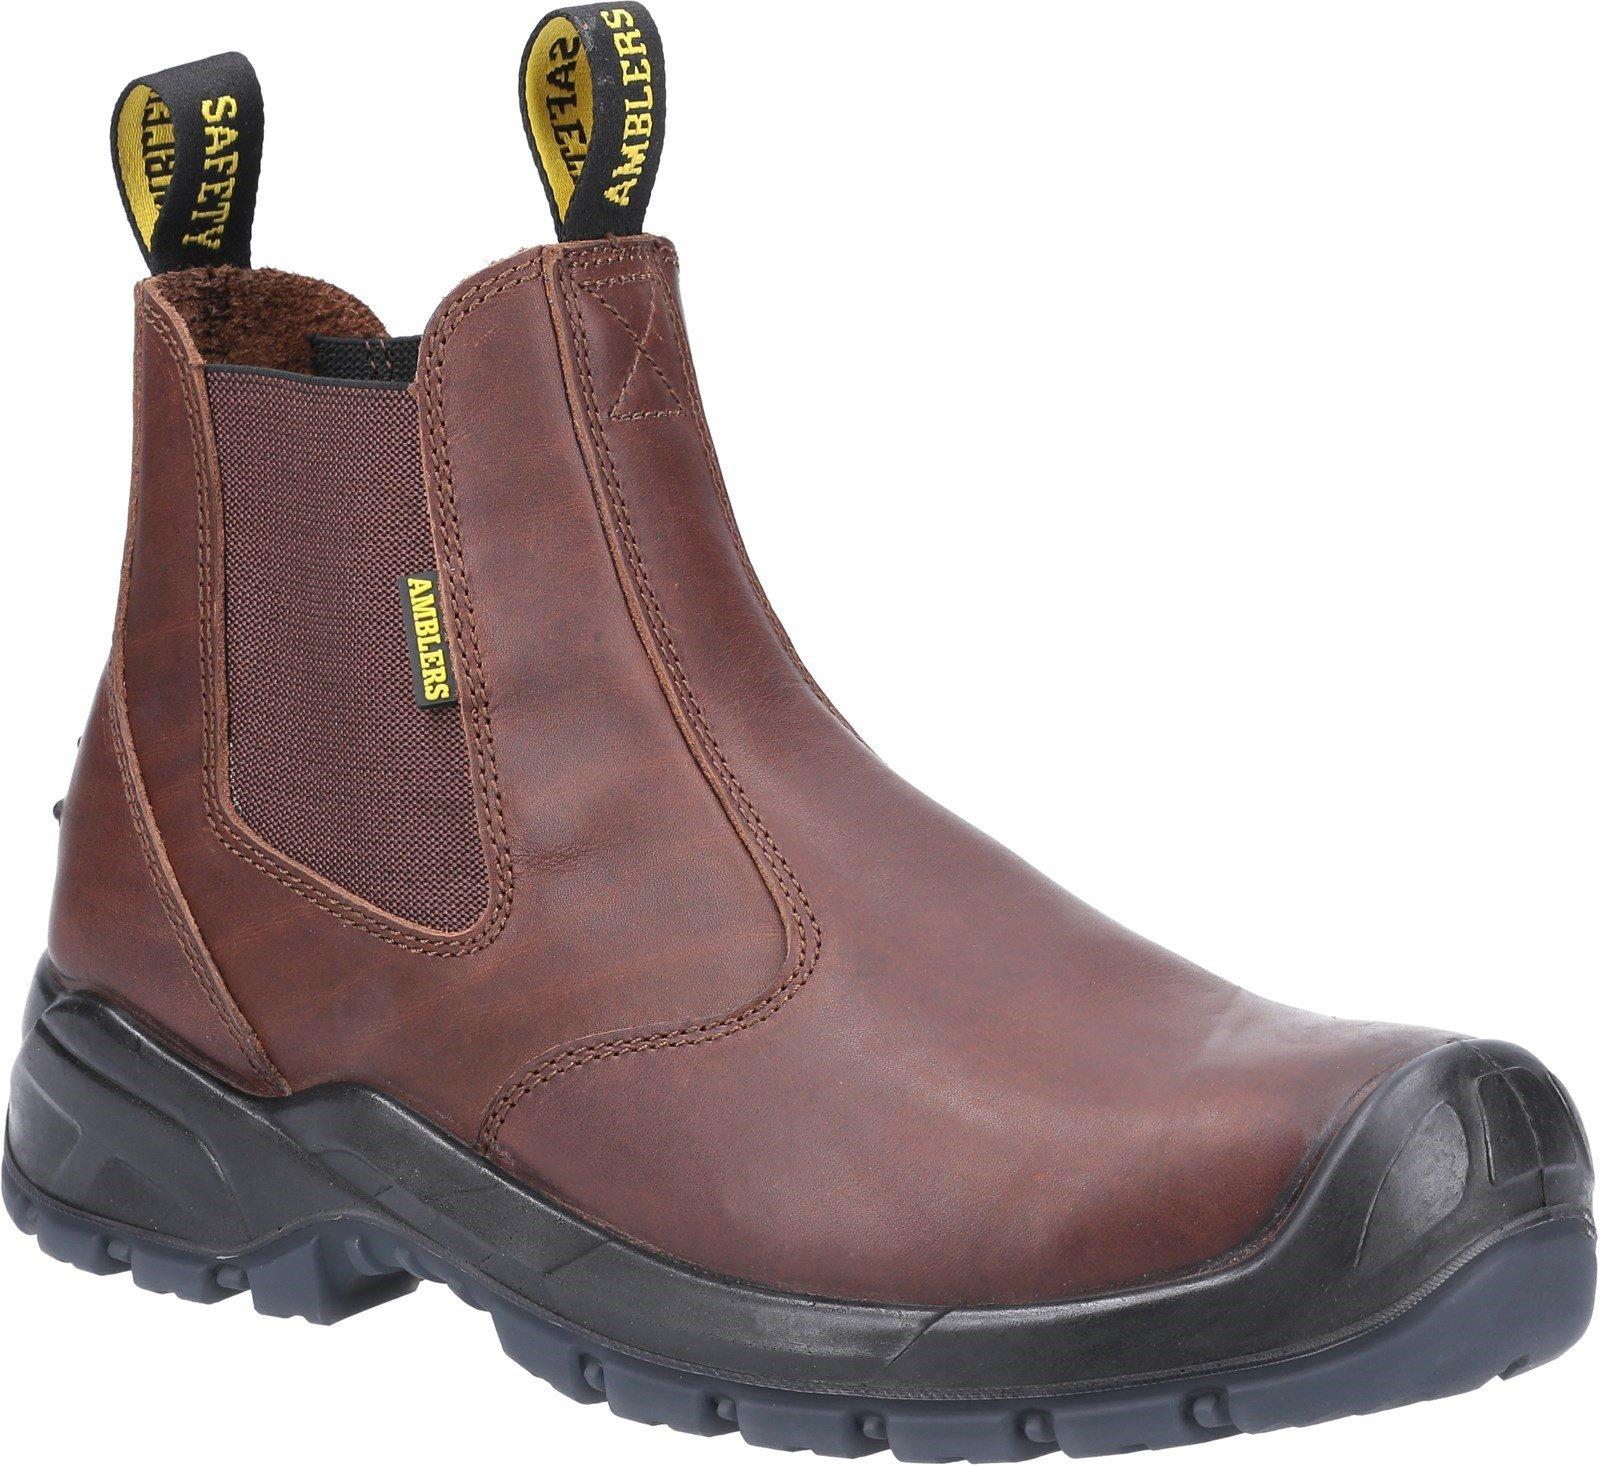 Amblers Safety Unisex Dealer Boot Brown 31378 - Brown 8